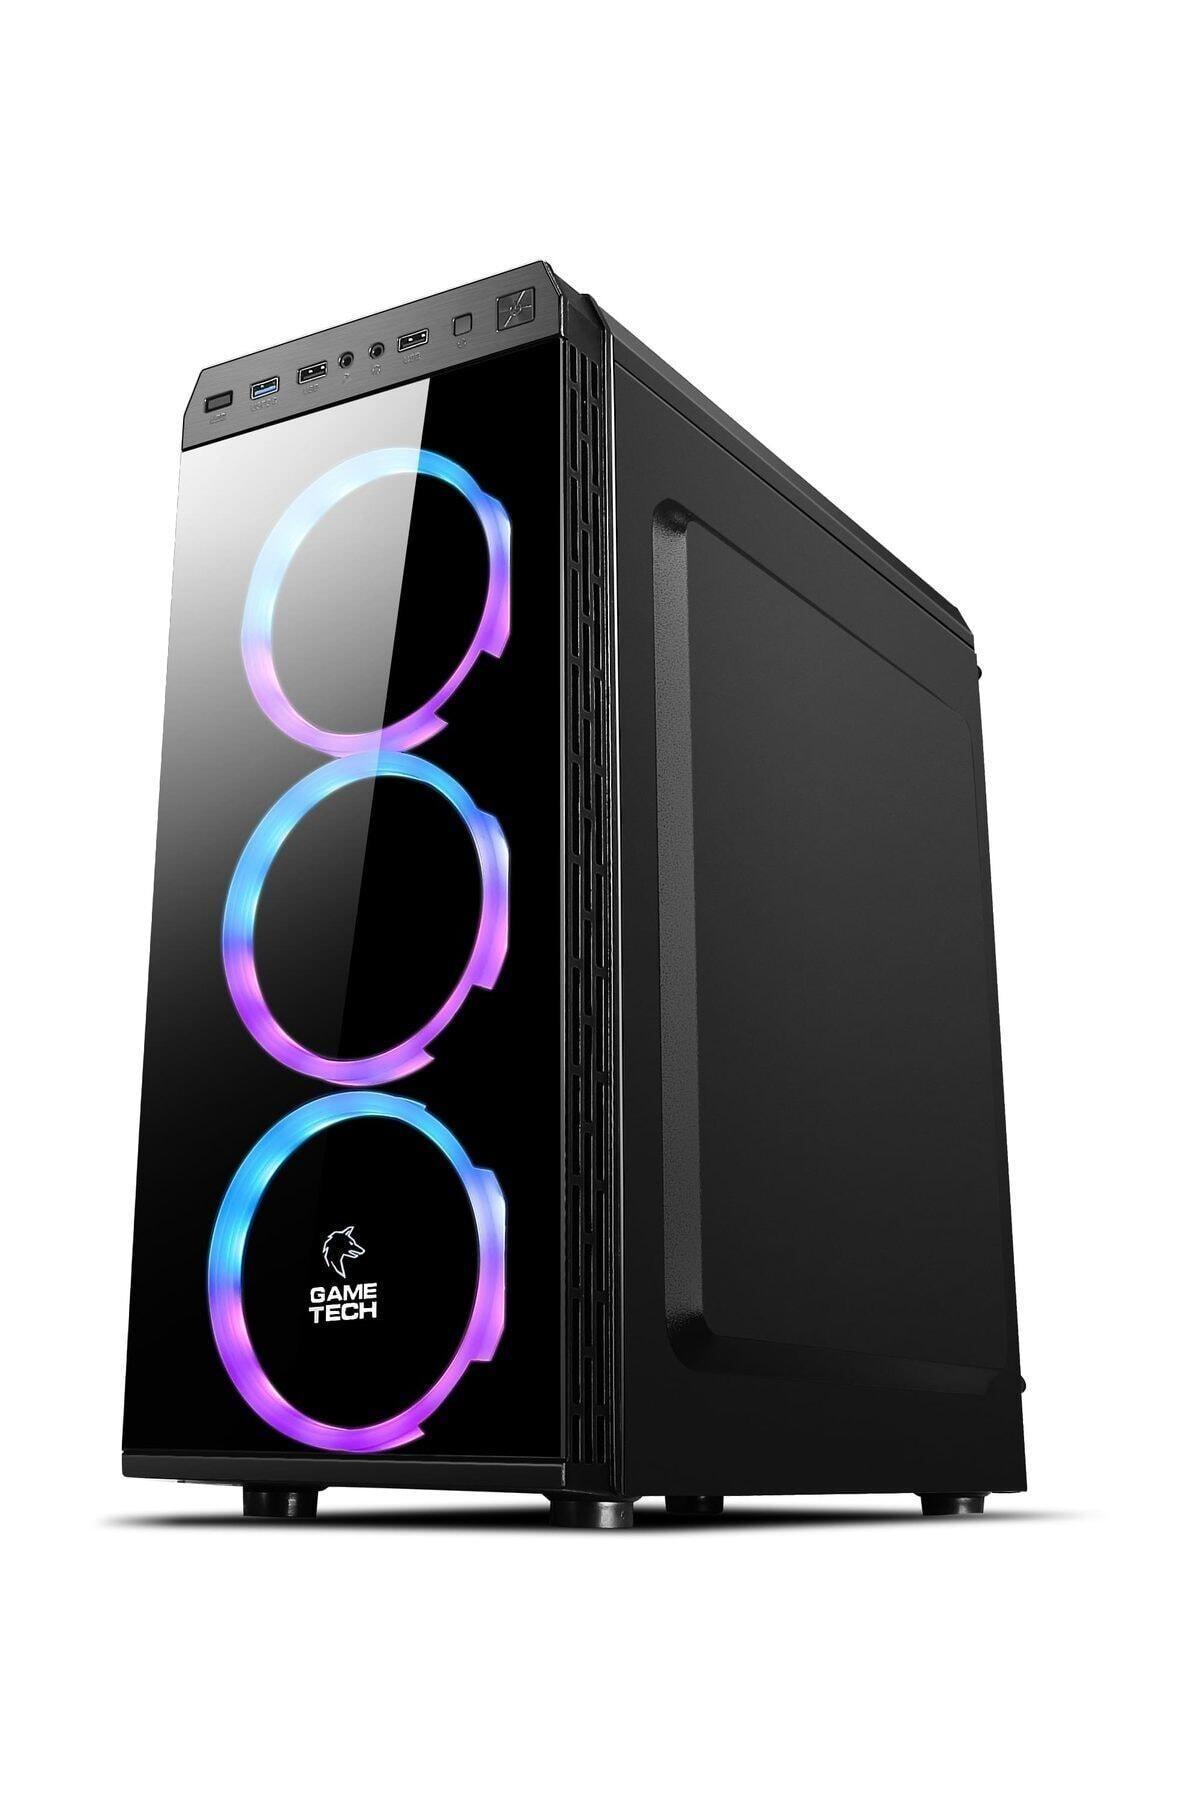 GAMETECH Gt-001 6x120mm Rainbow Fanlı Gaming Oyuncu Bilgisayar Kasası Psu Yok